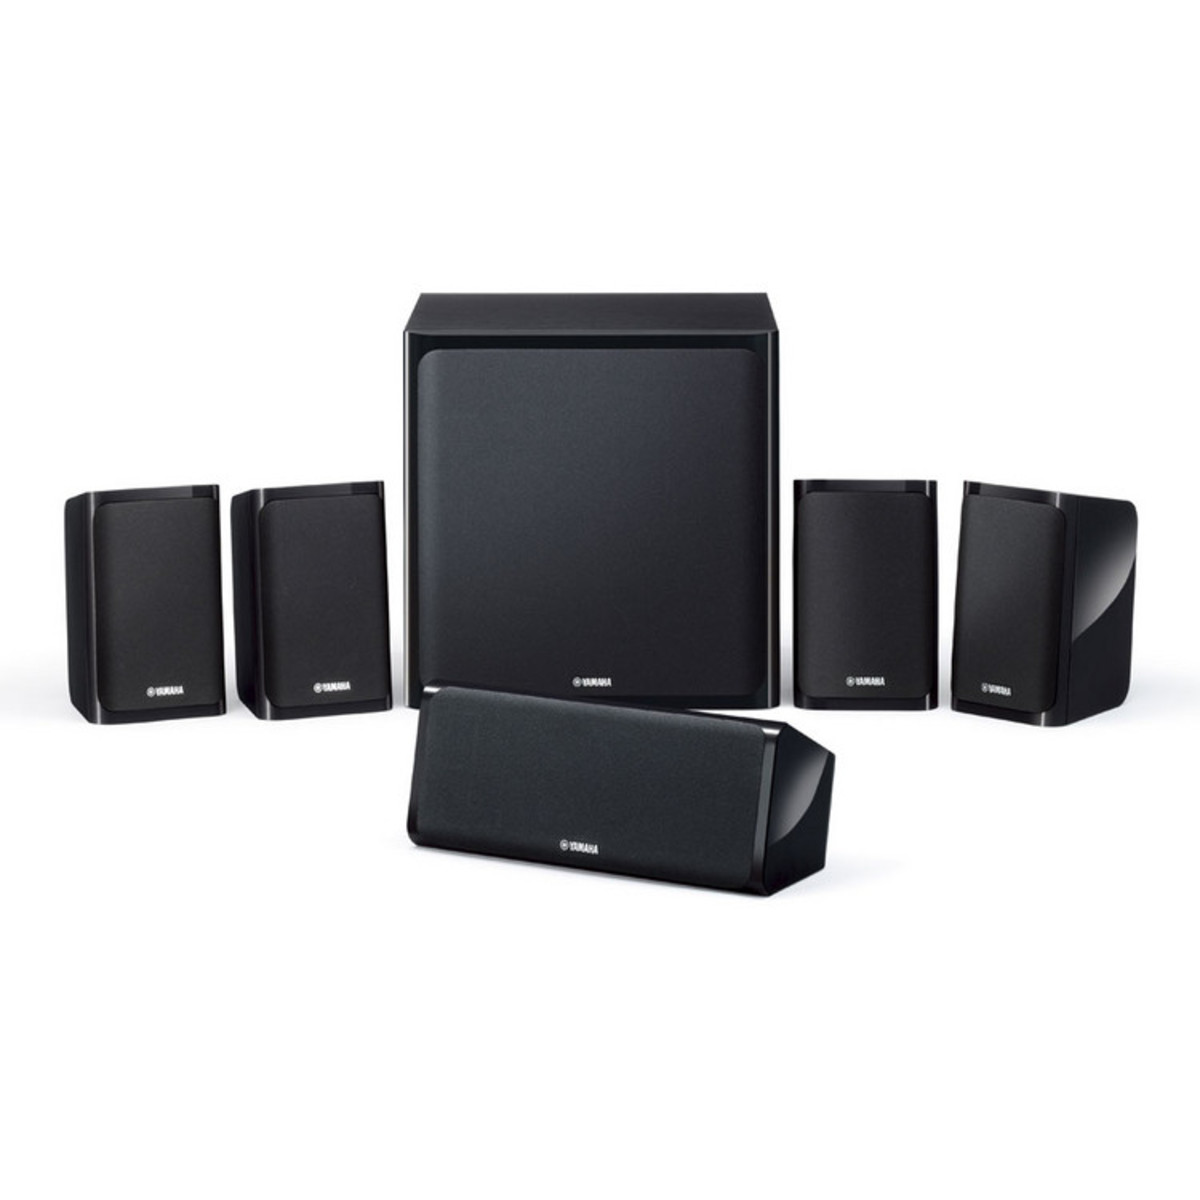 Yamaha ns p40 5 1 surround sound system black at for Yamaha sound system